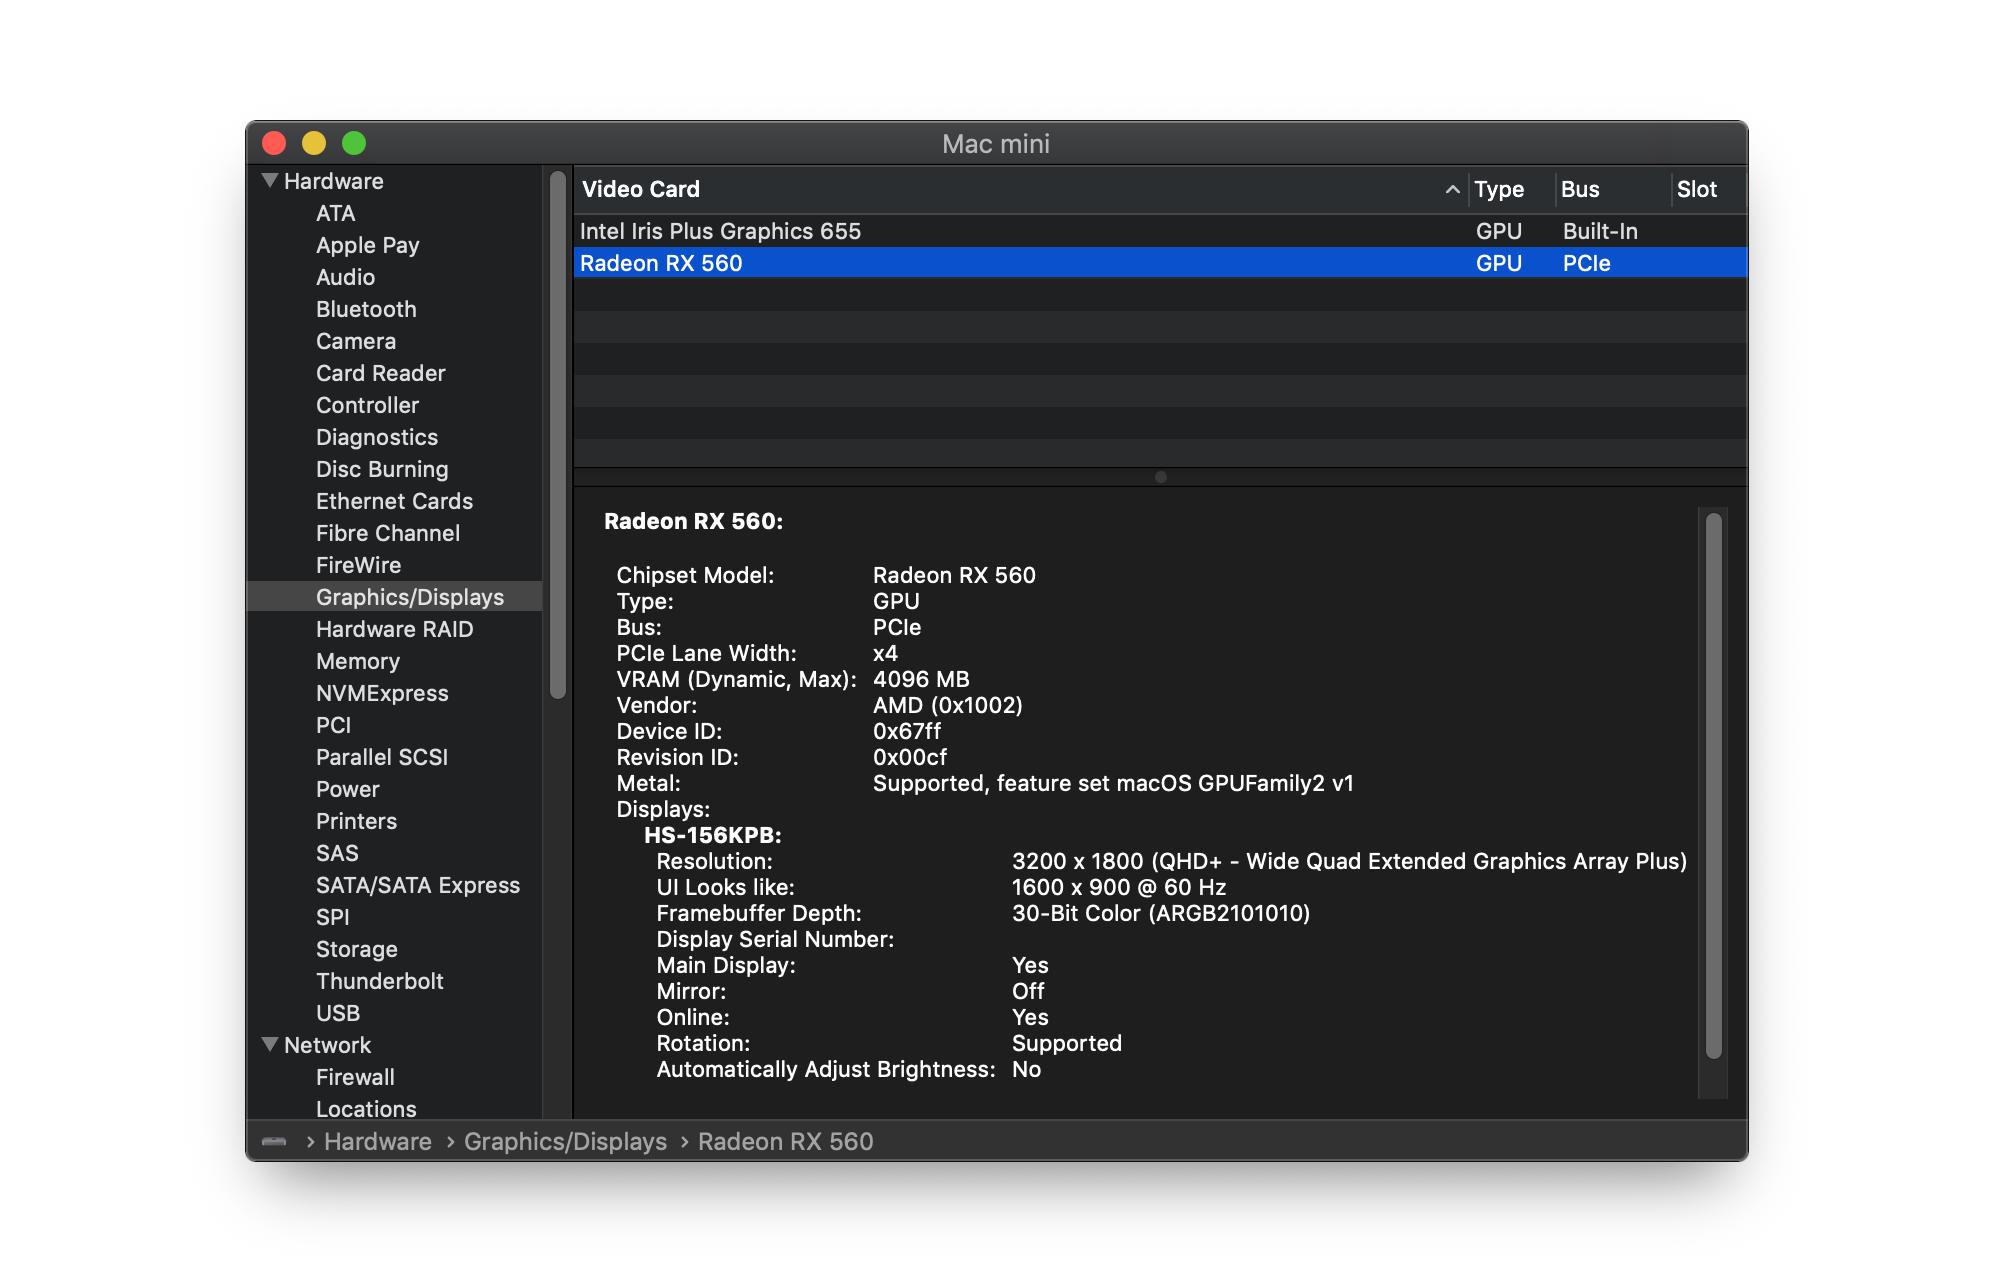 GitHub - sarkrui/NUC8i7BEH-Hackintosh-Build: [GUIDE